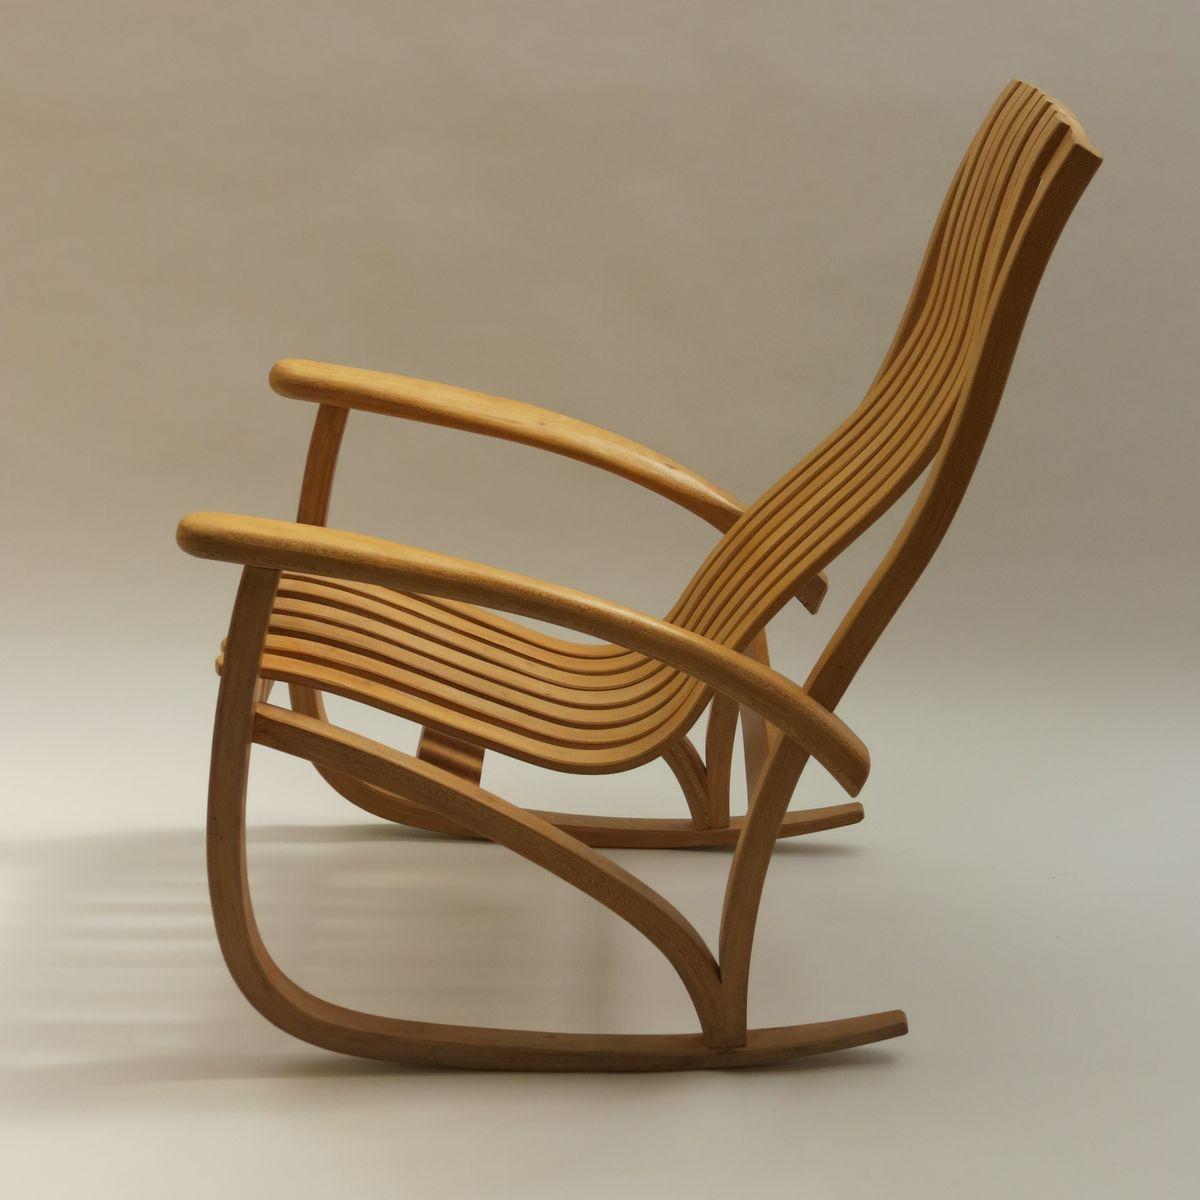 platane schaukelstuhl 1970er bei pamono kaufen. Black Bedroom Furniture Sets. Home Design Ideas